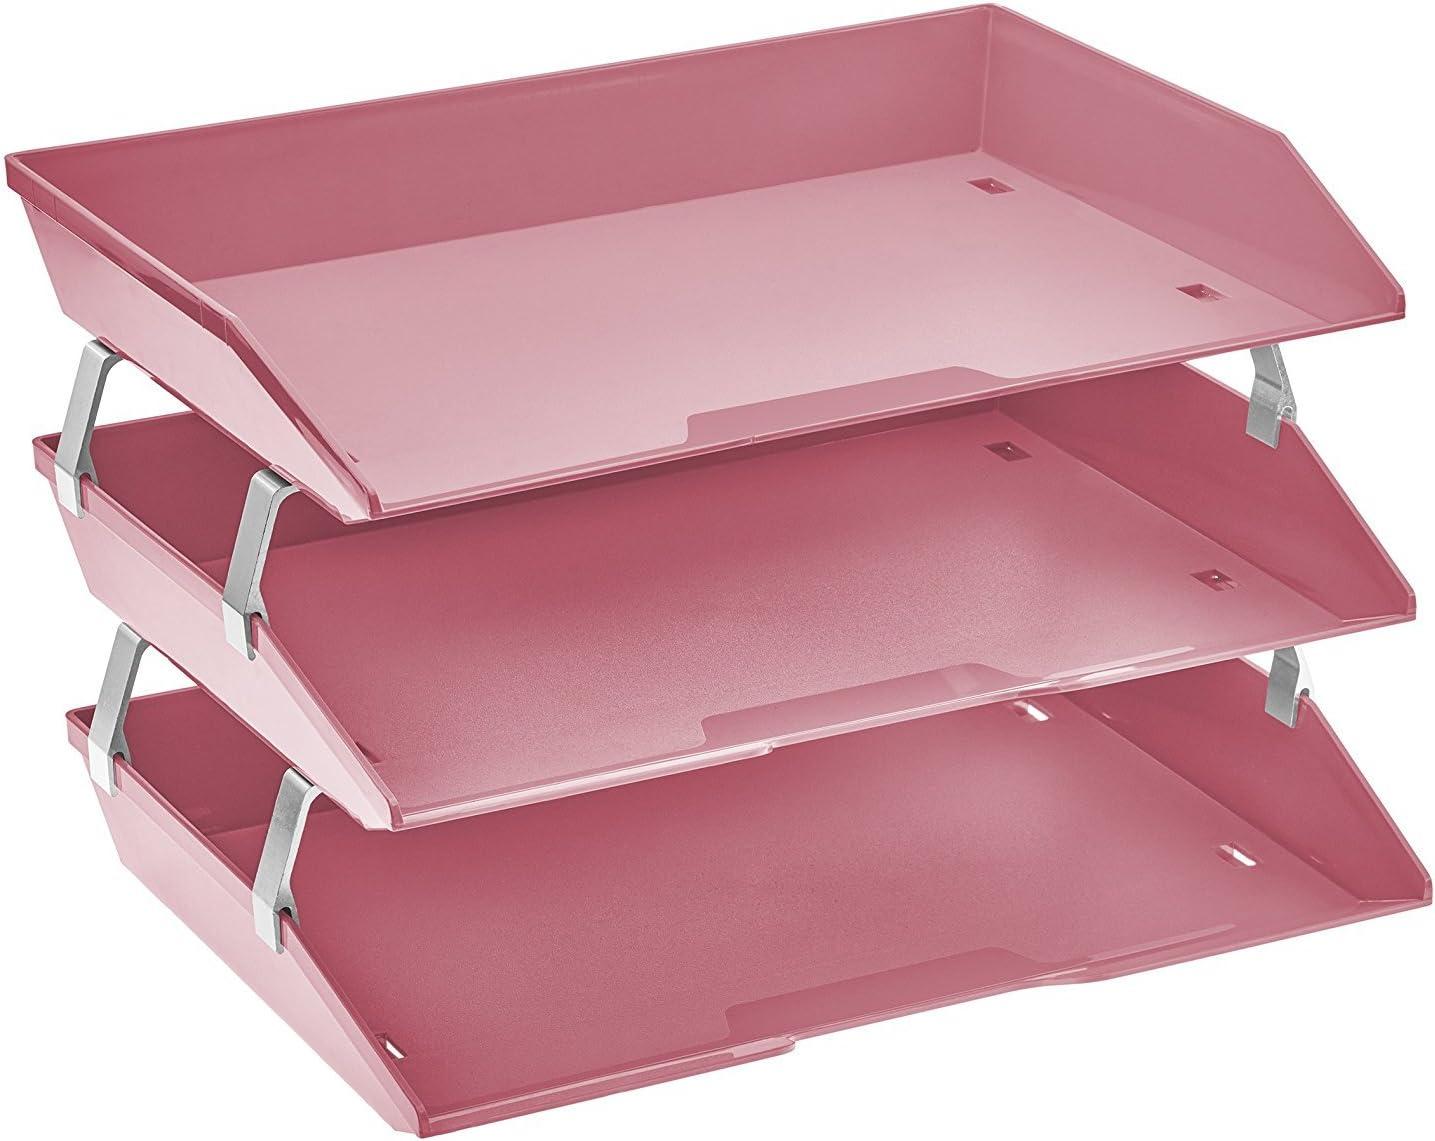 Acrimet Facility 3 Tier Letter Tray Side Load Plastic Desktop File Organizer (Solid Pink Color)